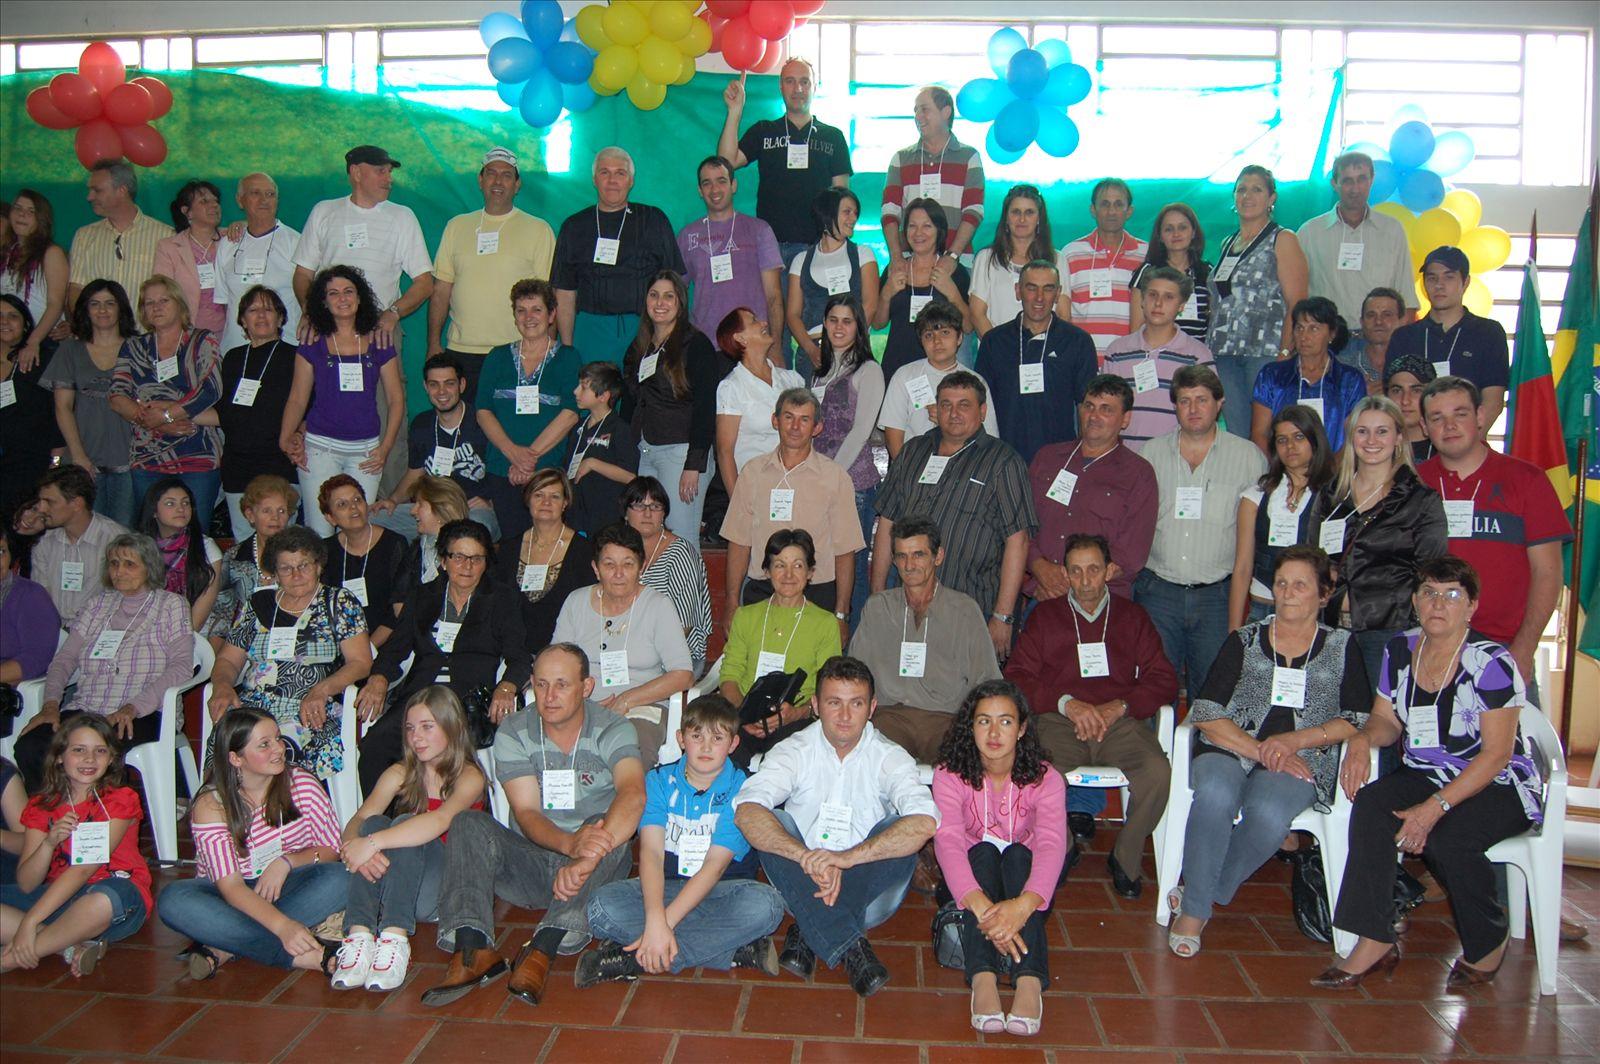 2º Encontro Família Cornelli - 11.10.2009 (166)_0